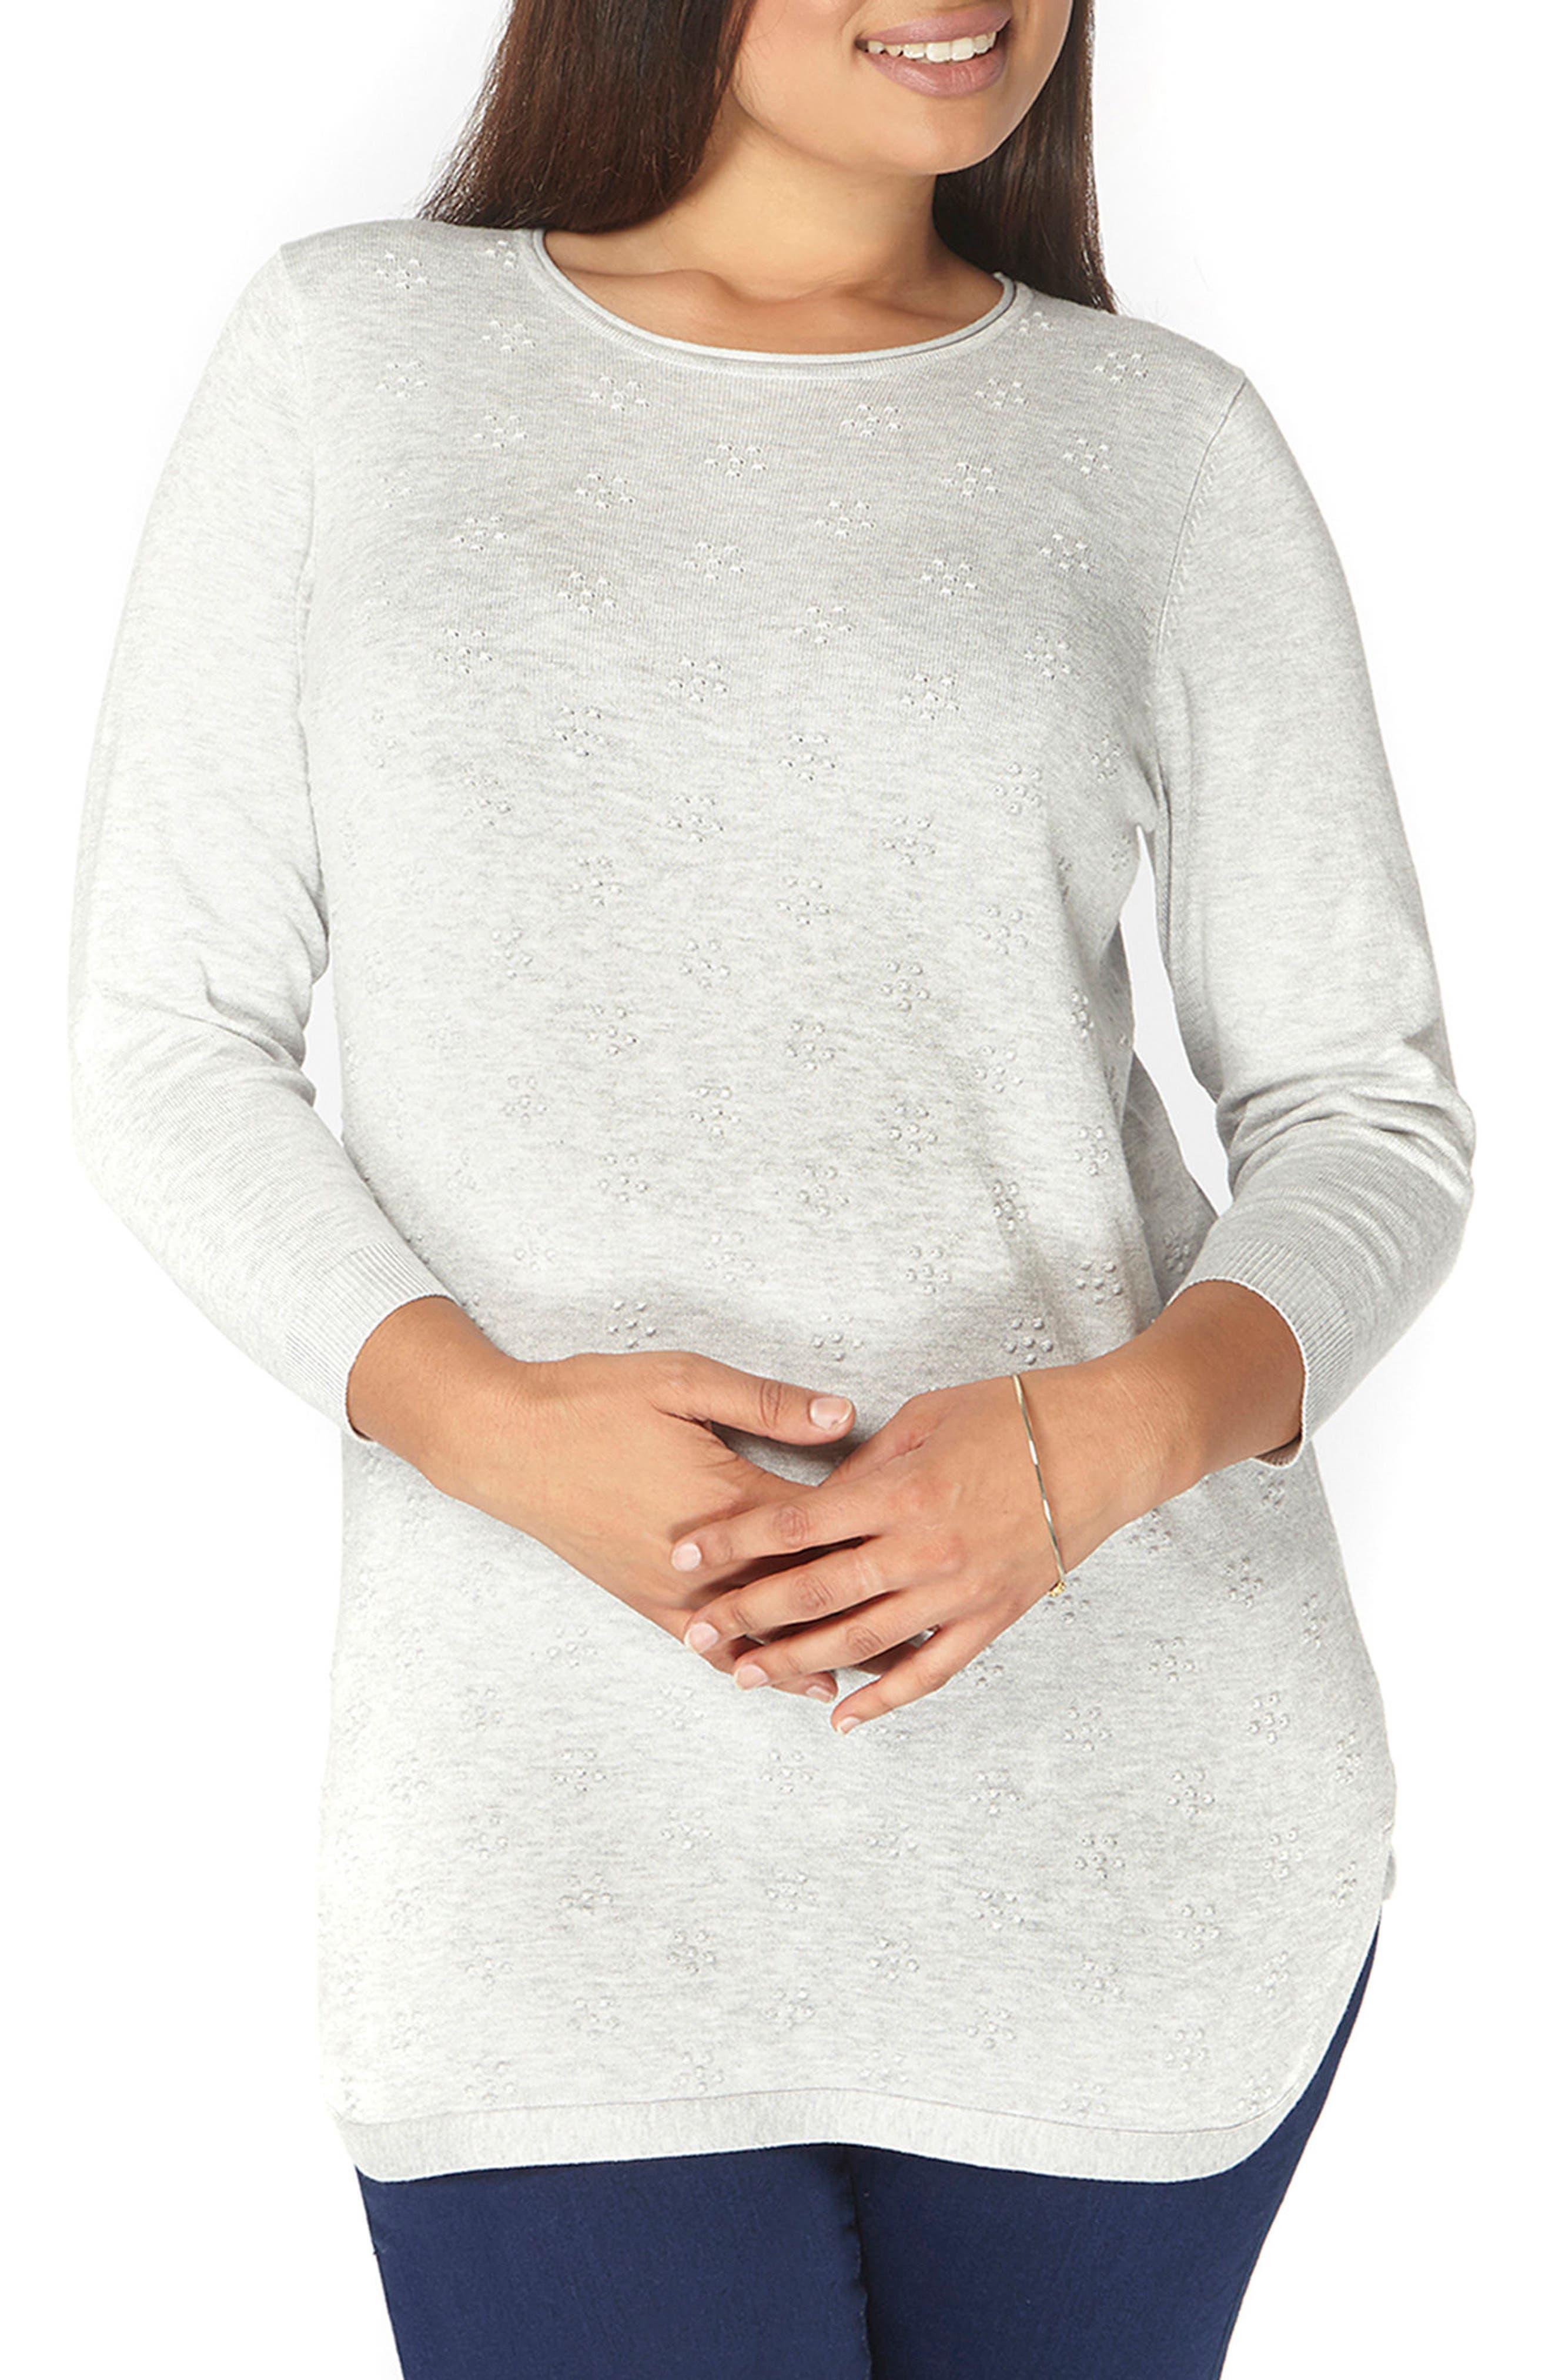 Dot Texture Sweater,                         Main,                         color, 020